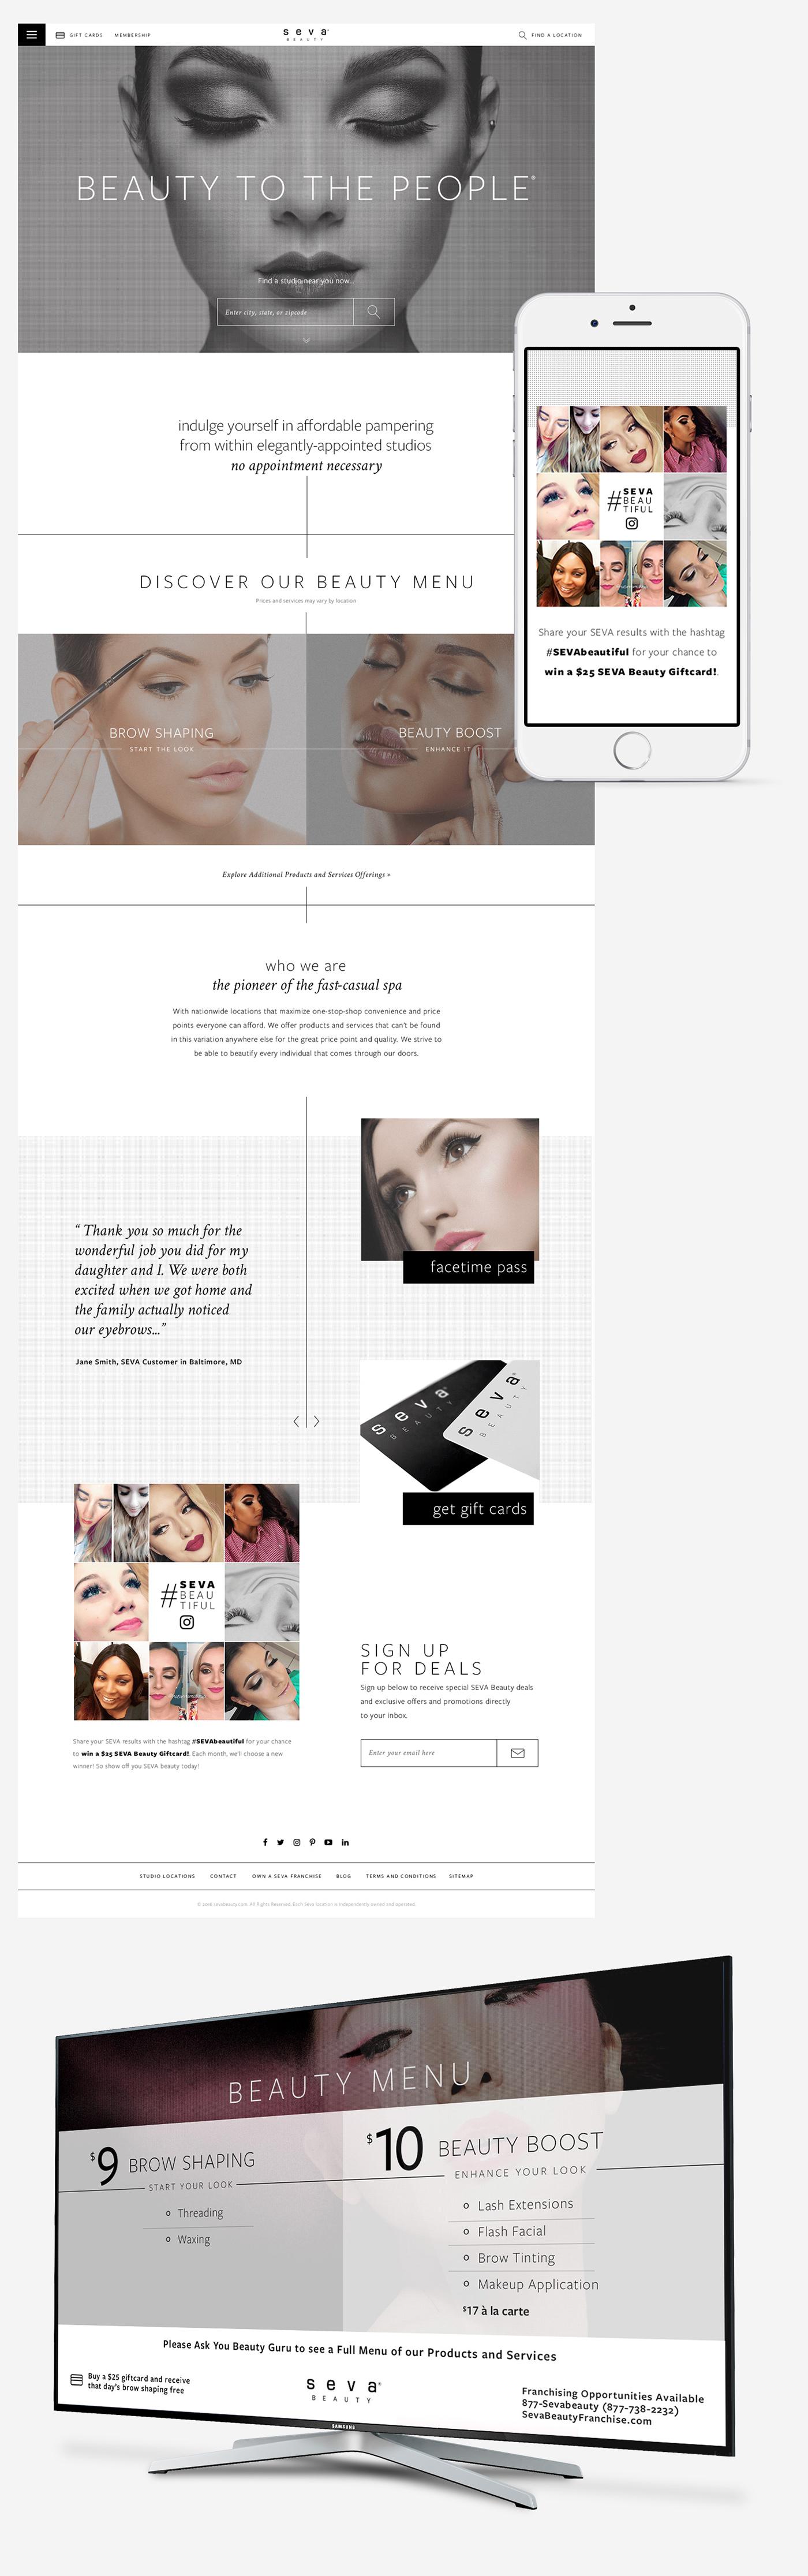 beauty Health Spa luxury Fashion  Web Design  Website Design modern sexy chic